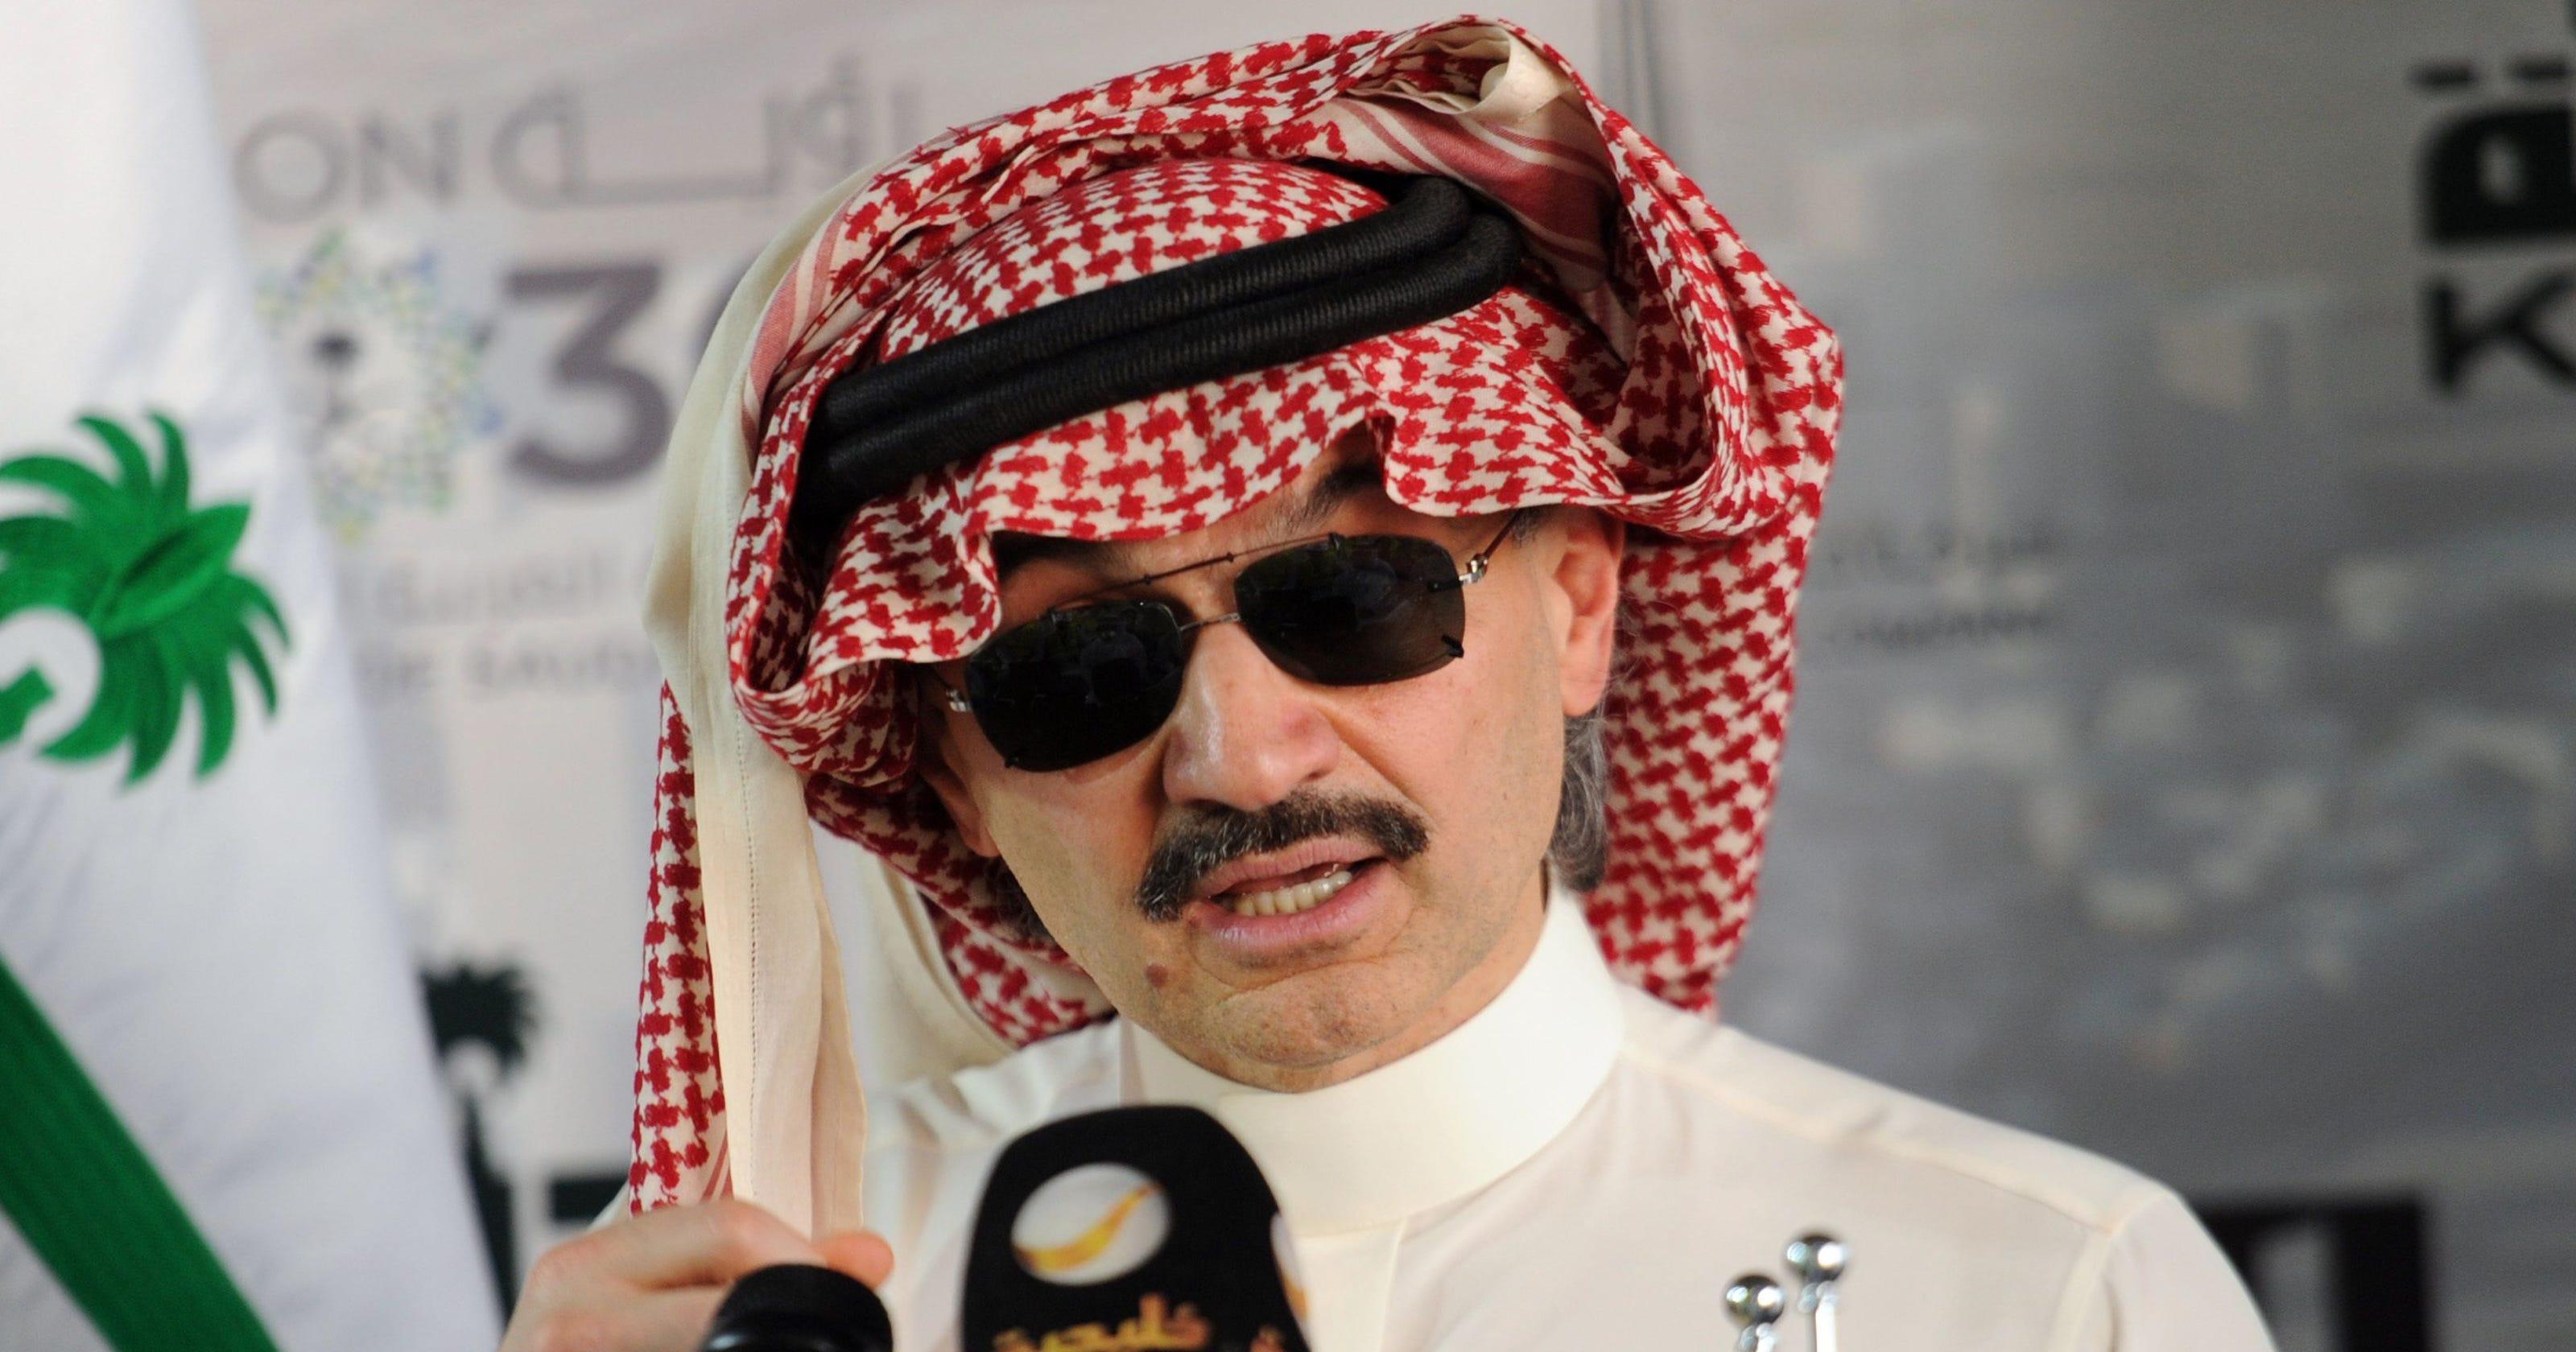 Saudi Arabia: Billionaire Prince Alwaleed bin Talal among